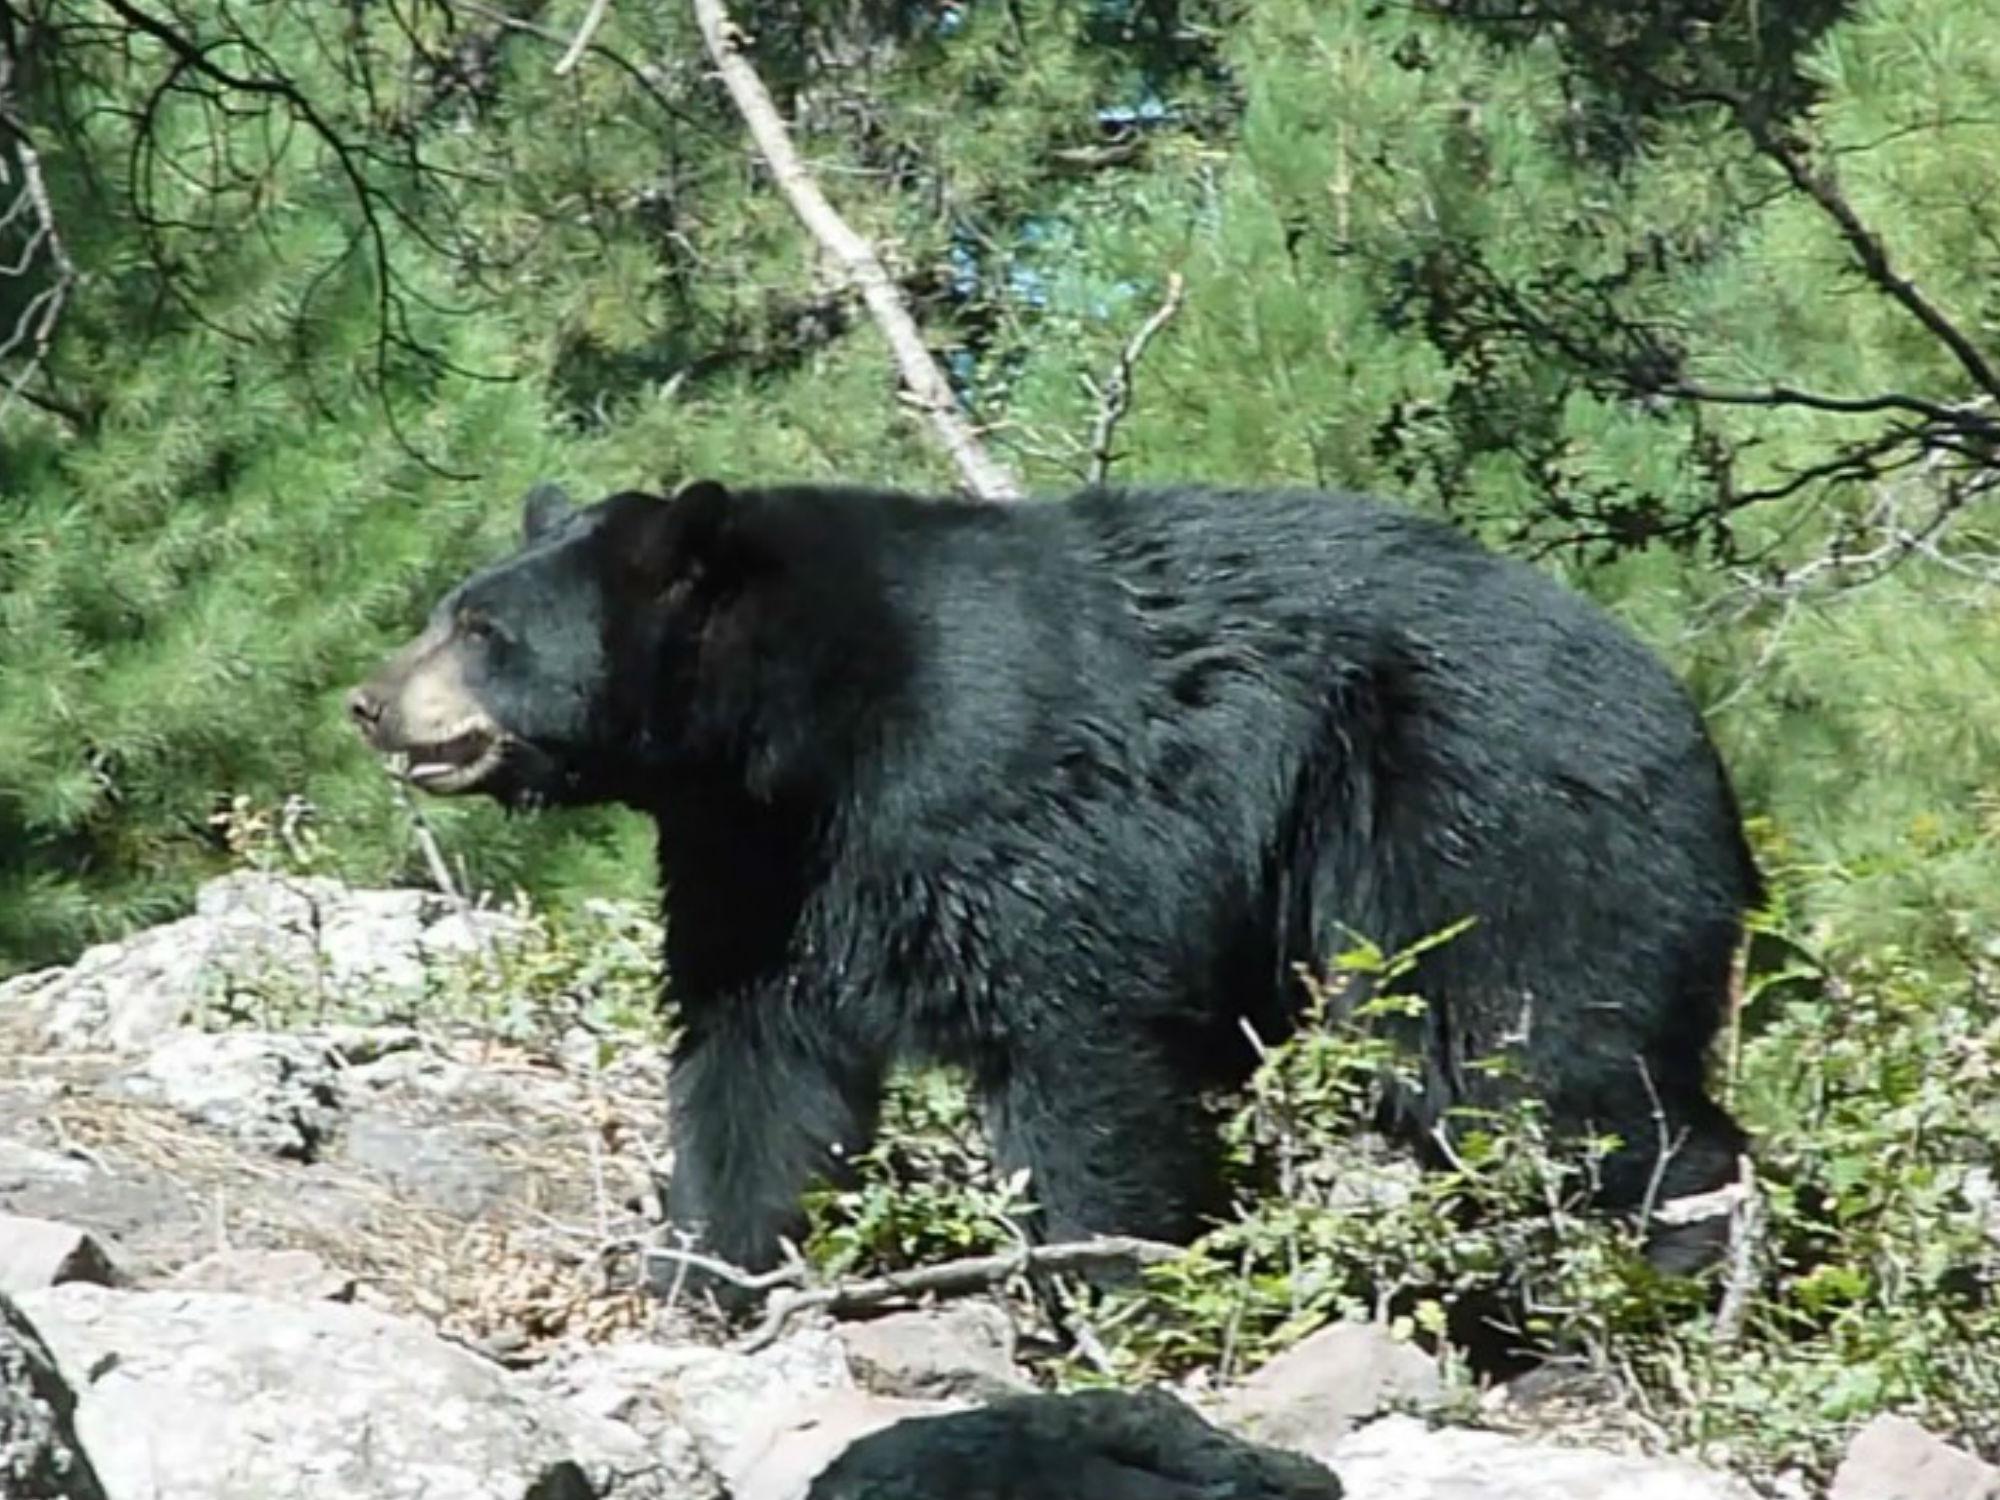 photo-matt-boulton-black-bear-licensed-under-cc-by-sa-2.0